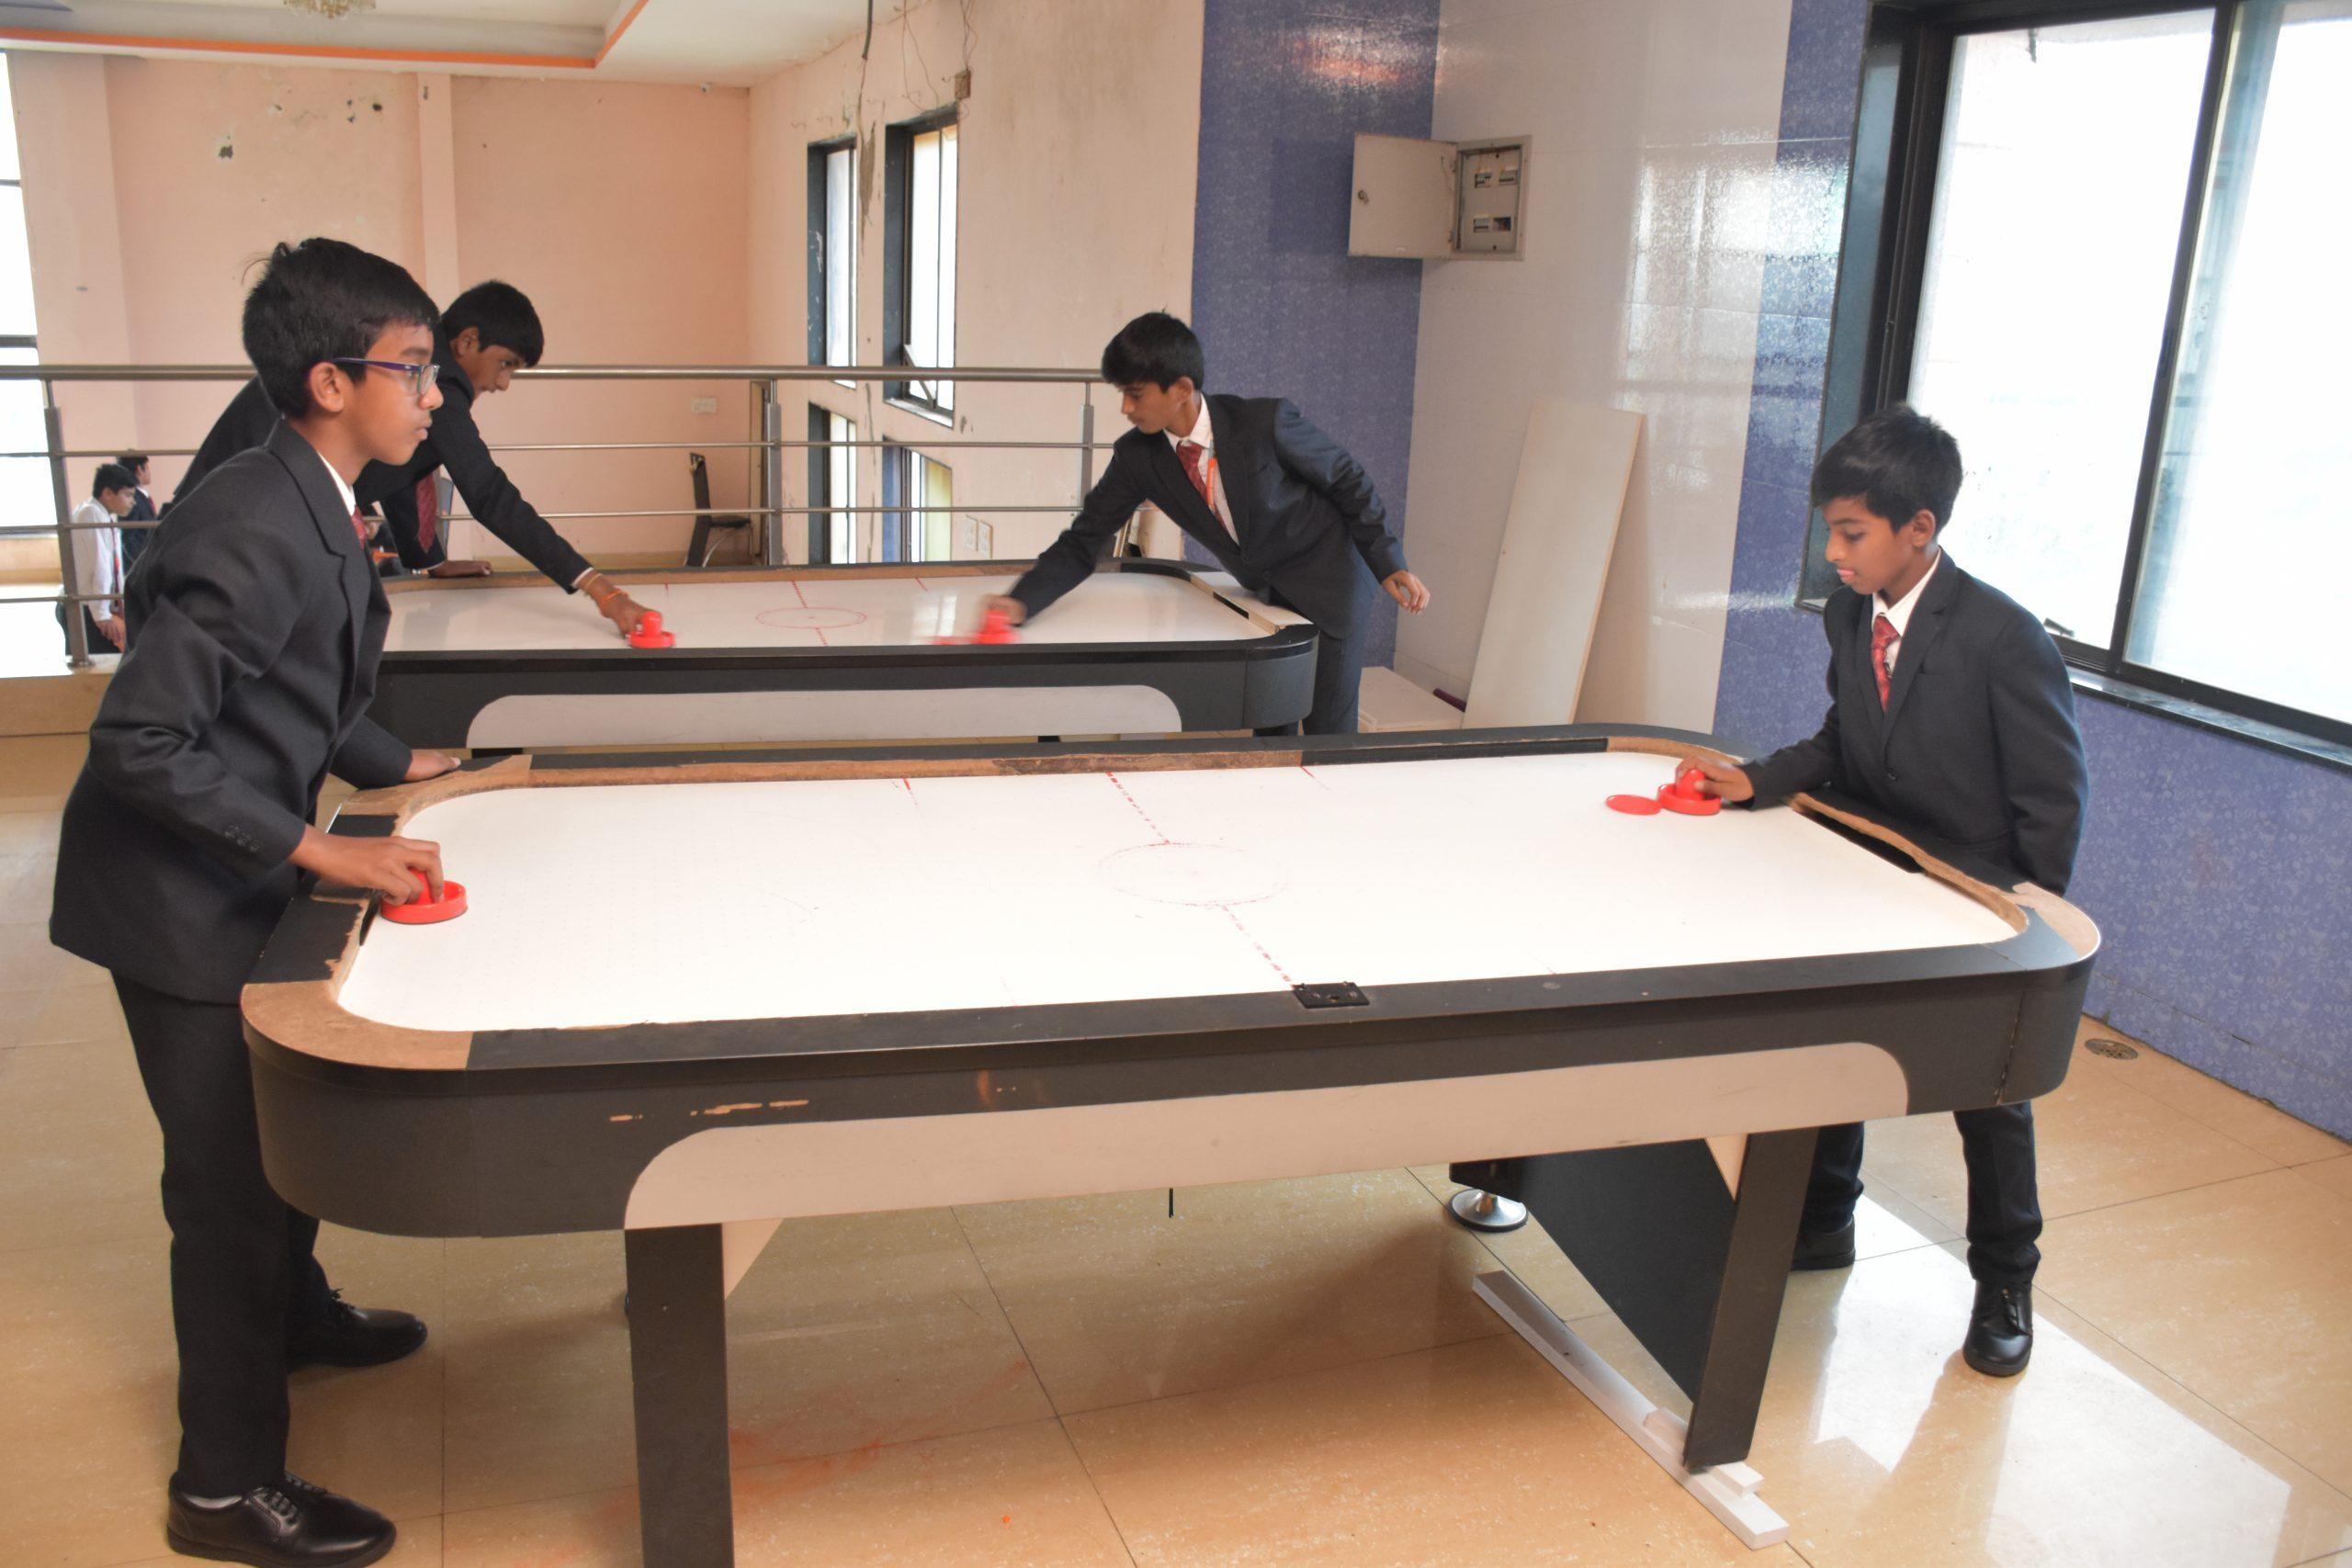 SHREE NEELAKANTH VIDYAPEETH Students Playing Table Tennis